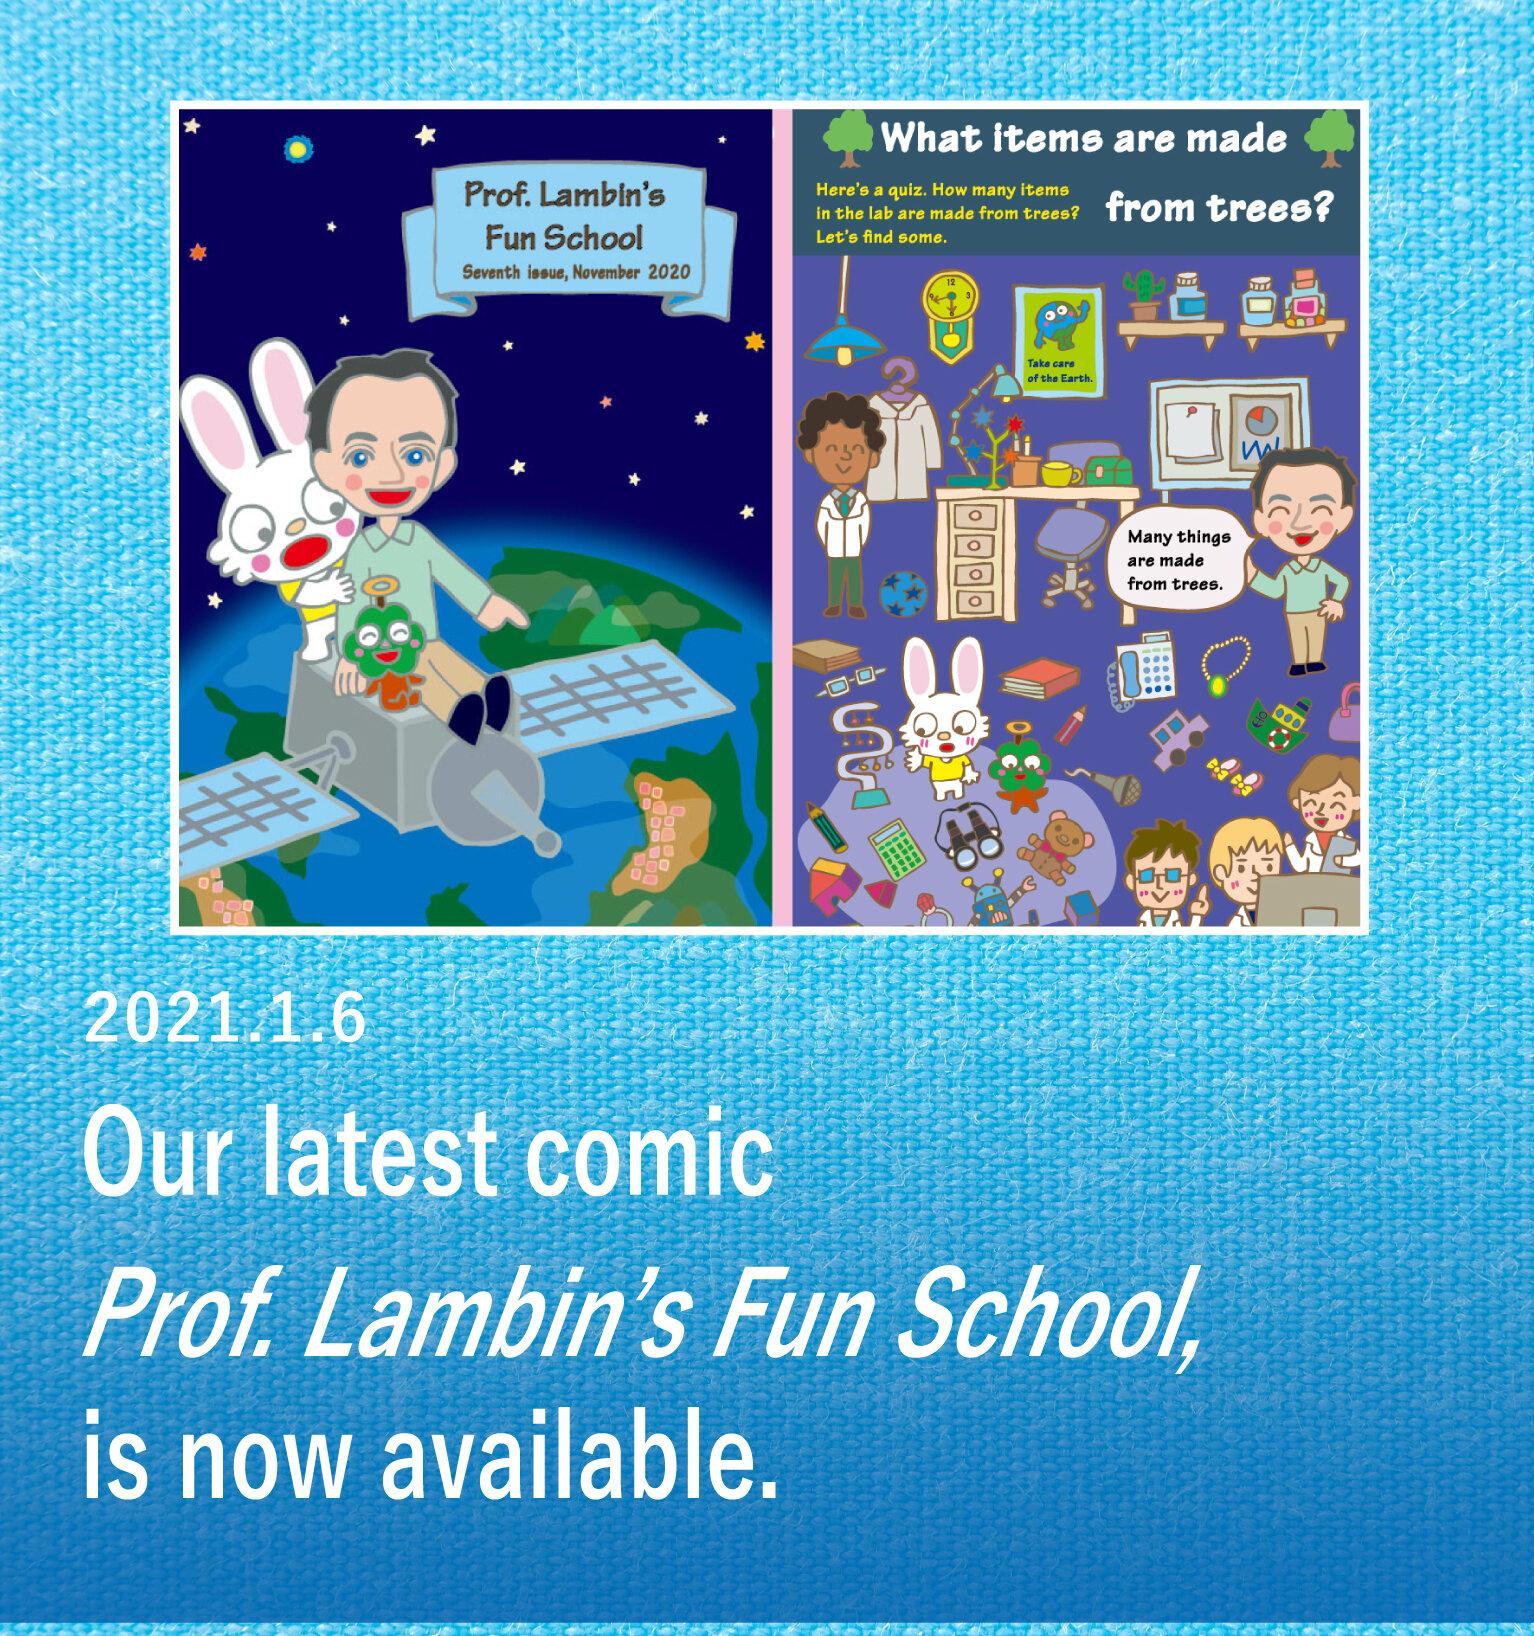 Prof. Lambin's Fun School has been published